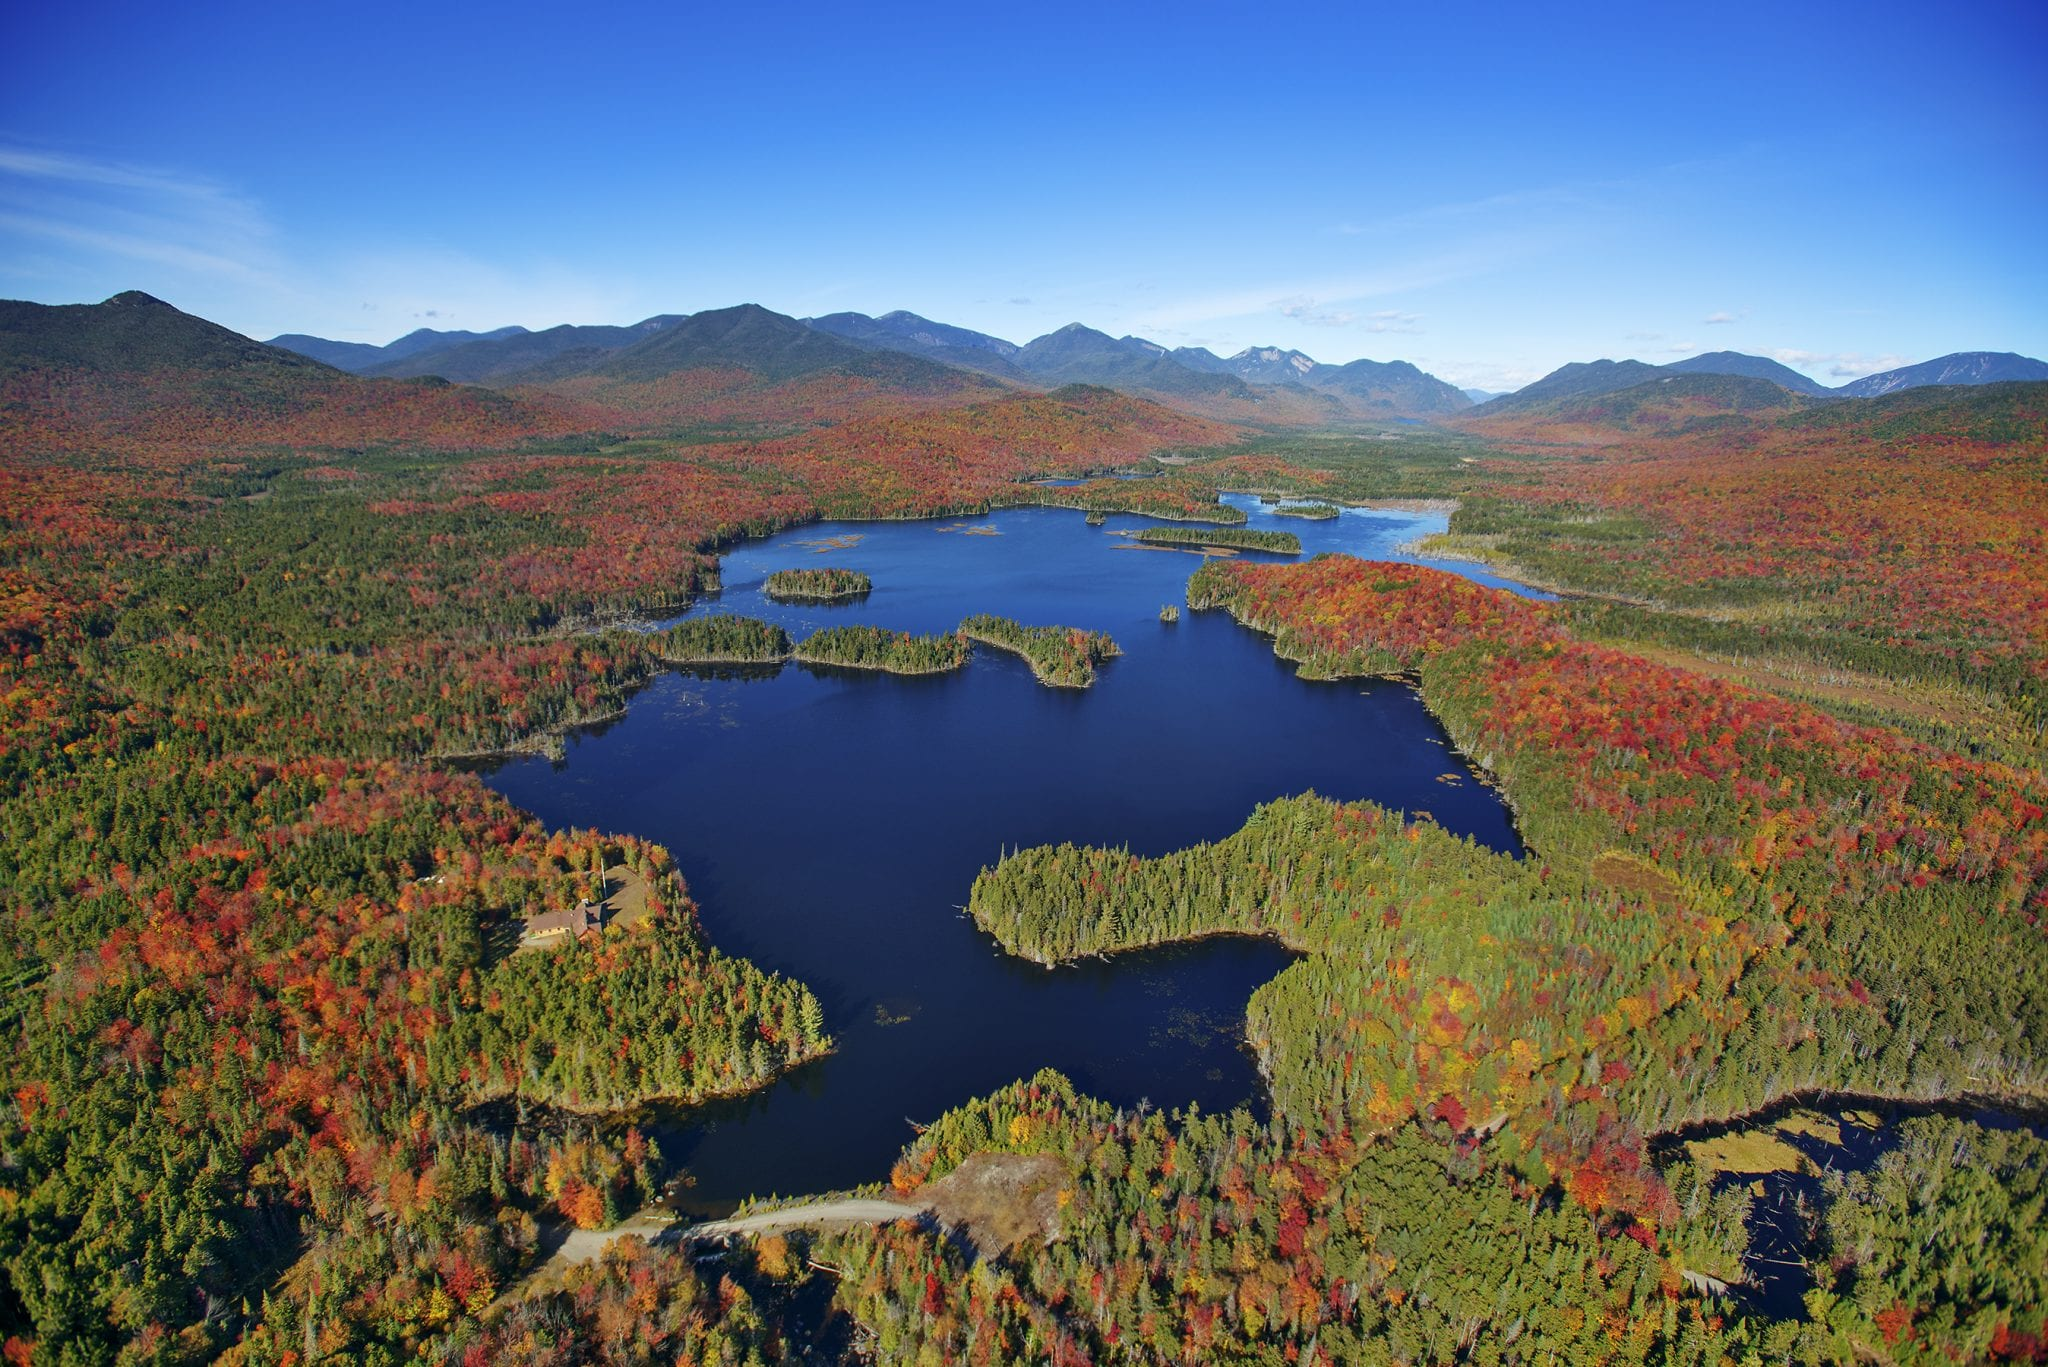 Boreas Ponds Dam photo by Carl Heilman/Wild Visions, Inc. courtesy of the Adirondack Council.